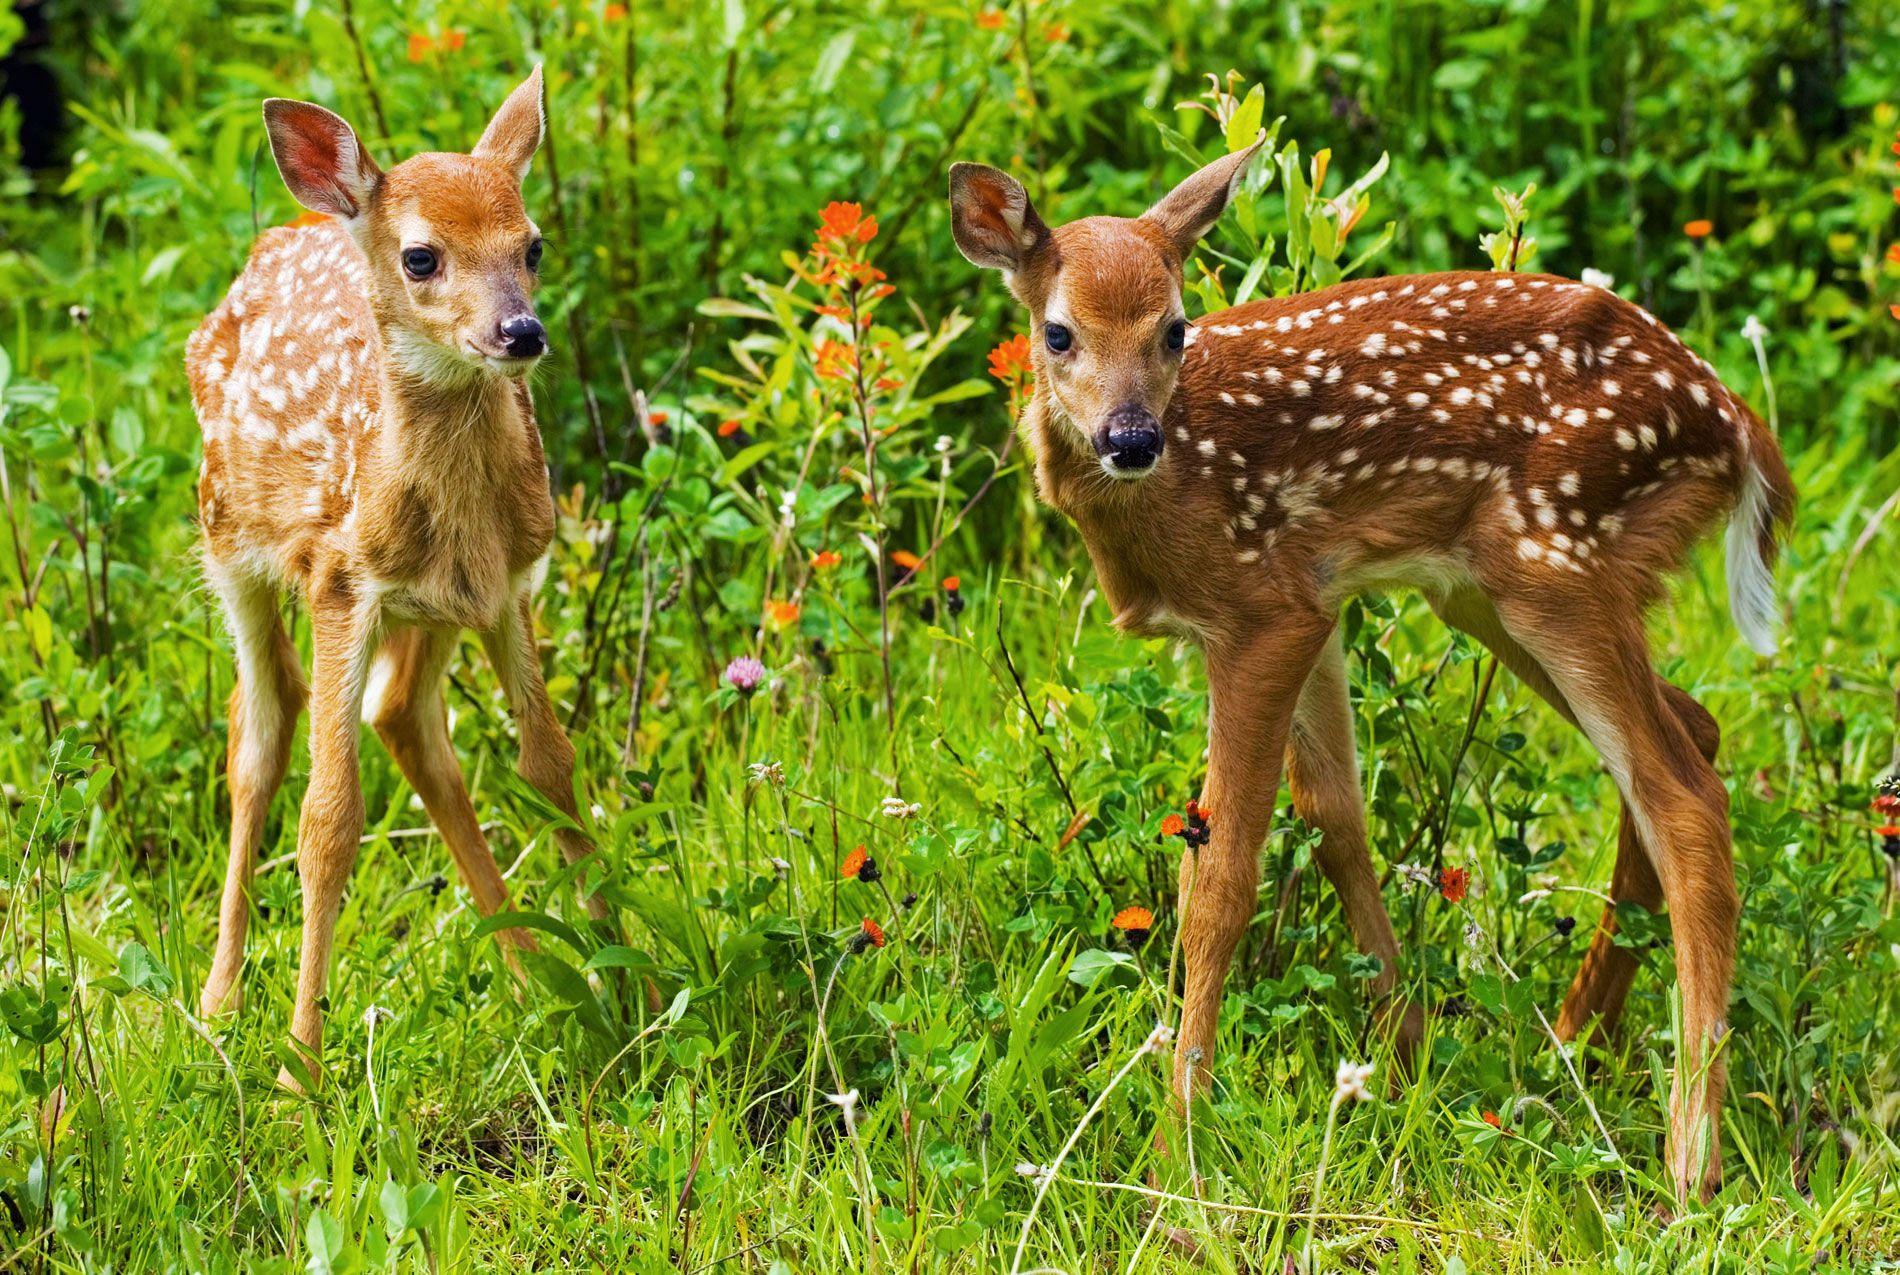 Baby Deer Wallpaper 2014 Free 15 HD Wallpapers Deer